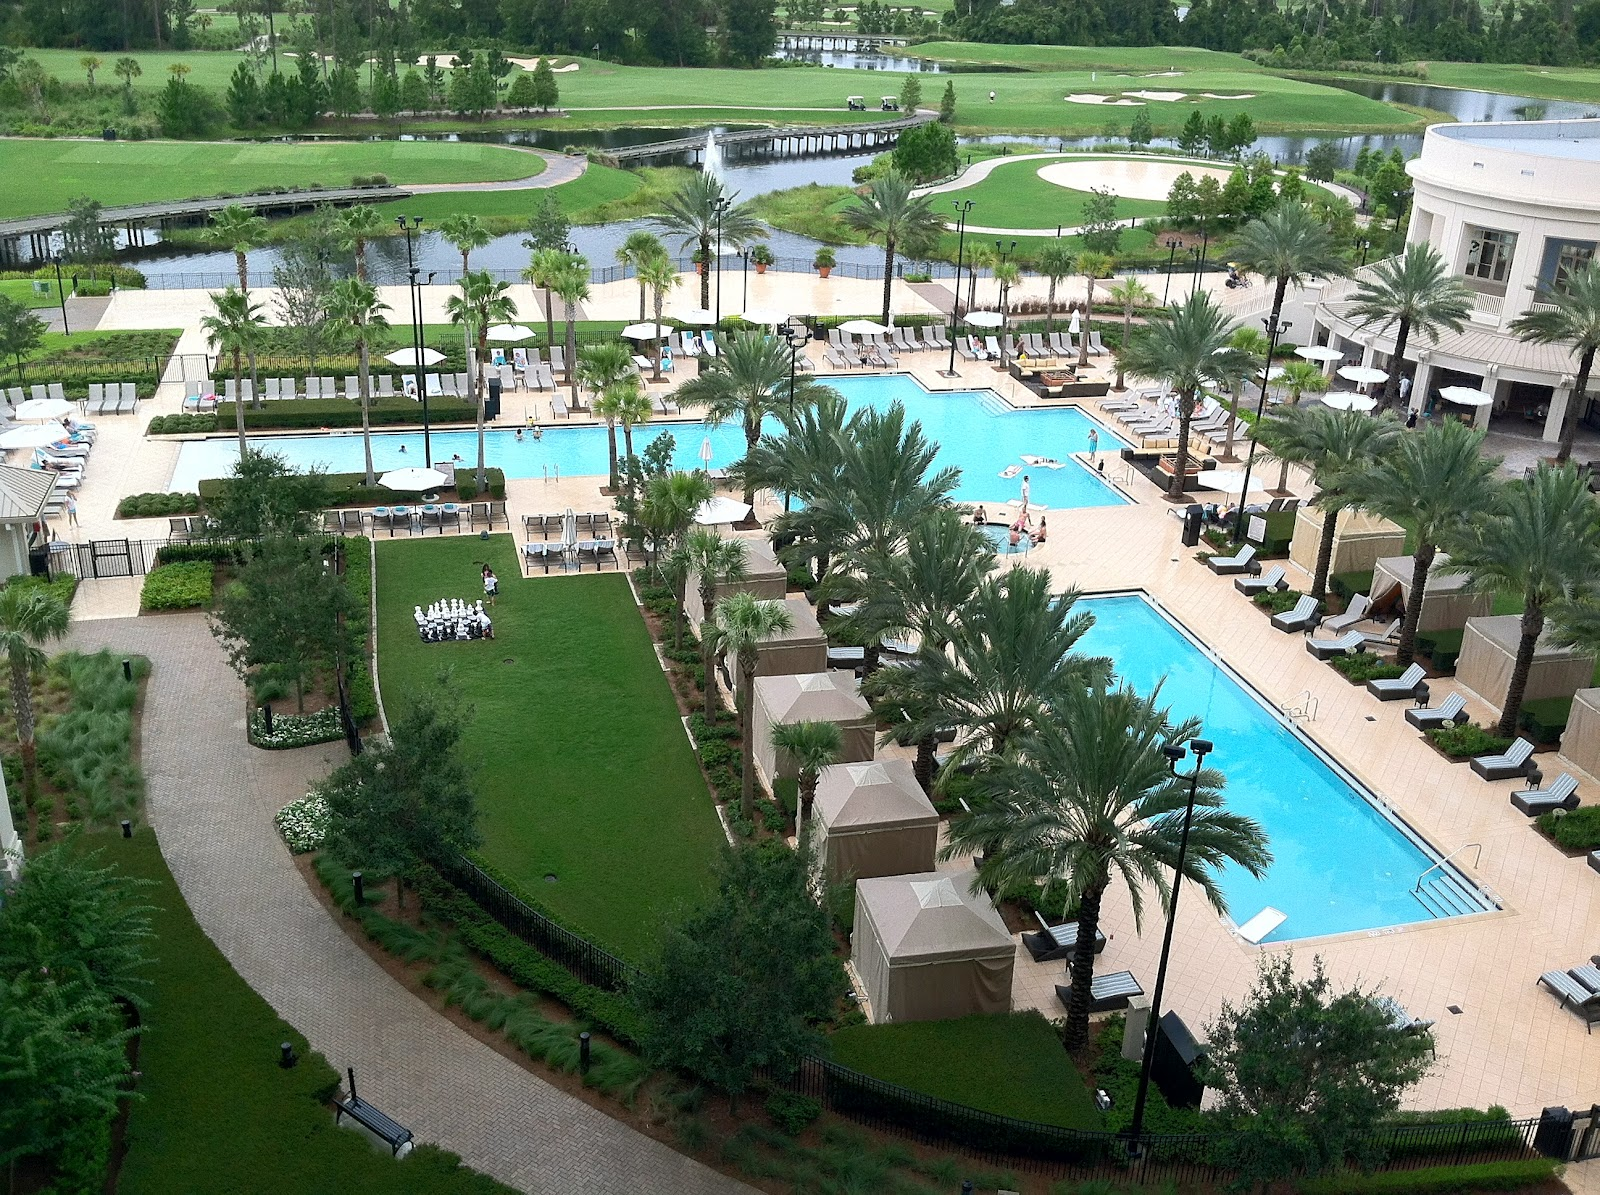 Rooms: Luxury Hotels: Waldorf Astoria Orlando Specials